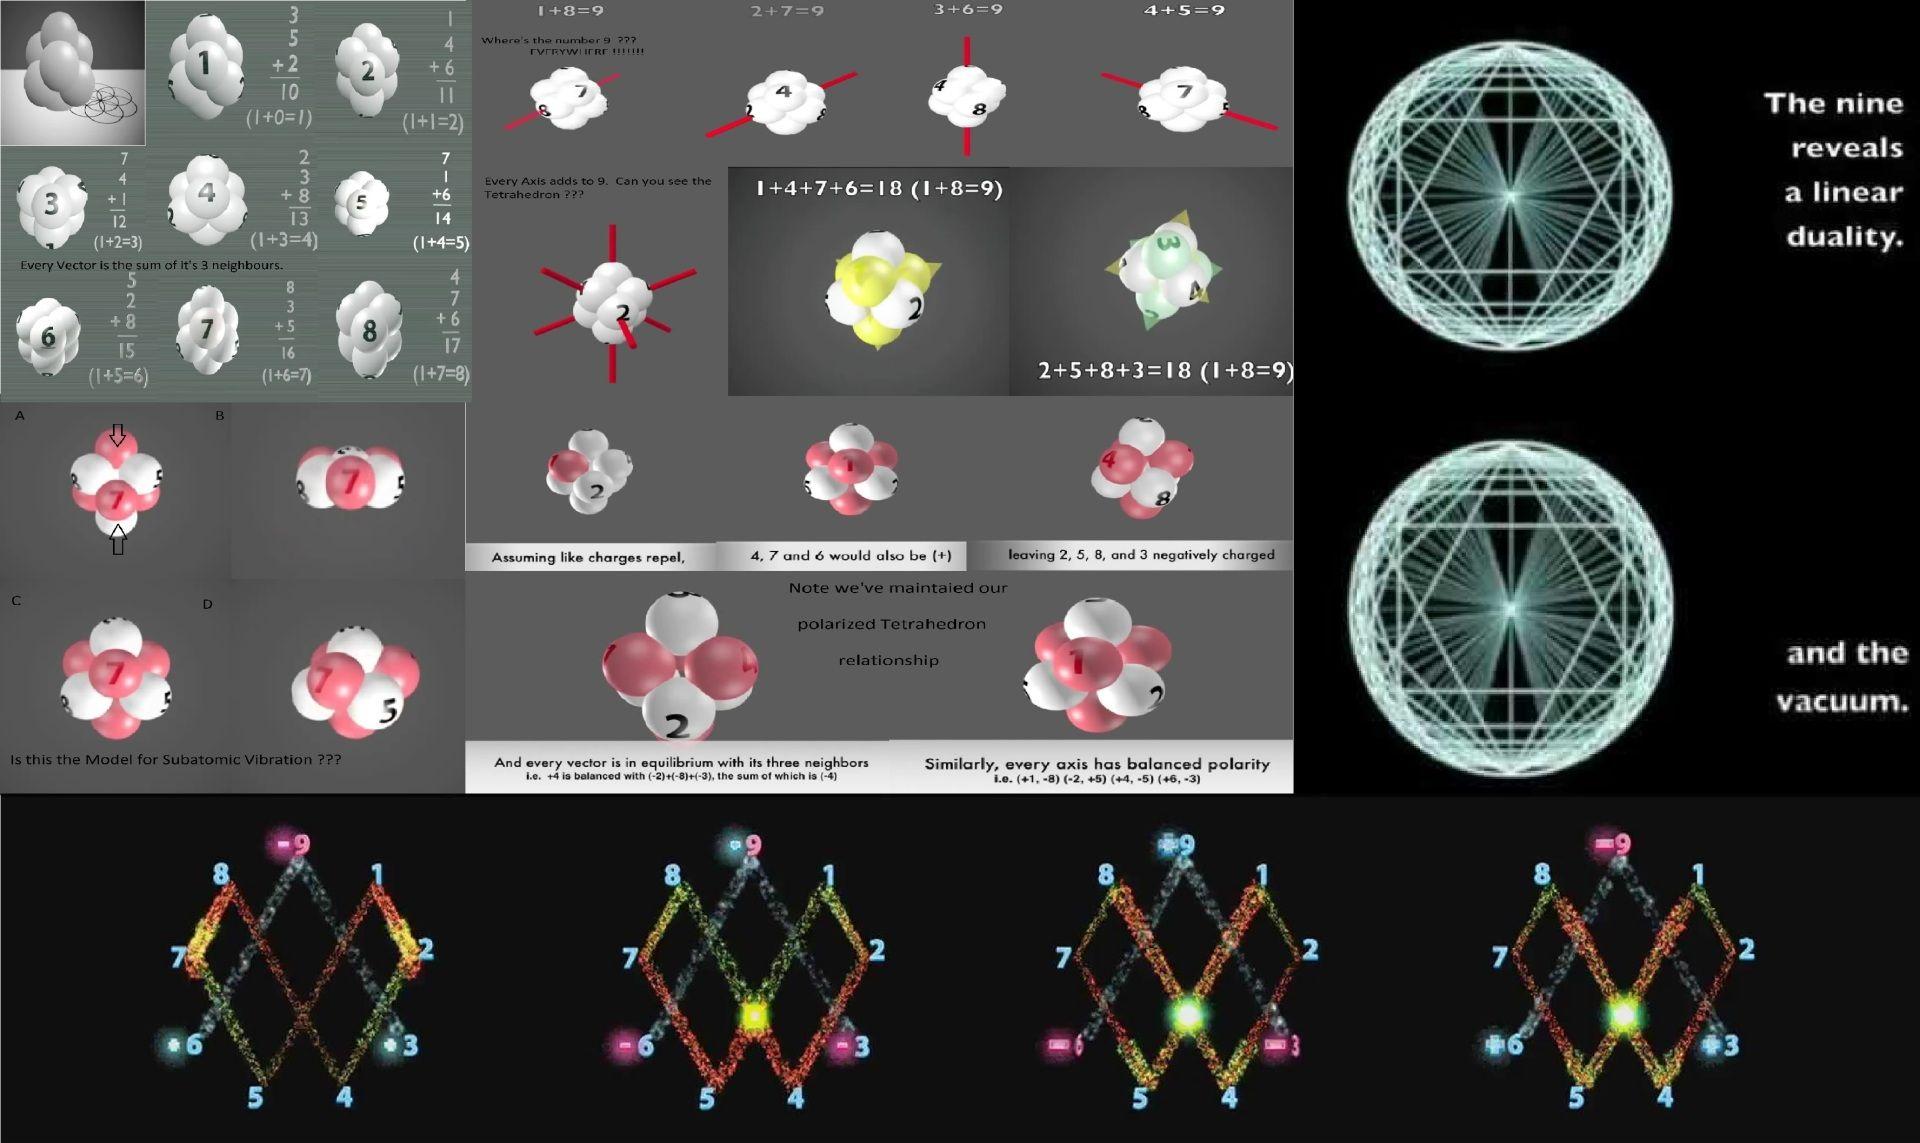 Flower of Life, 9 Code, Vortex Math Ancient Mysteries